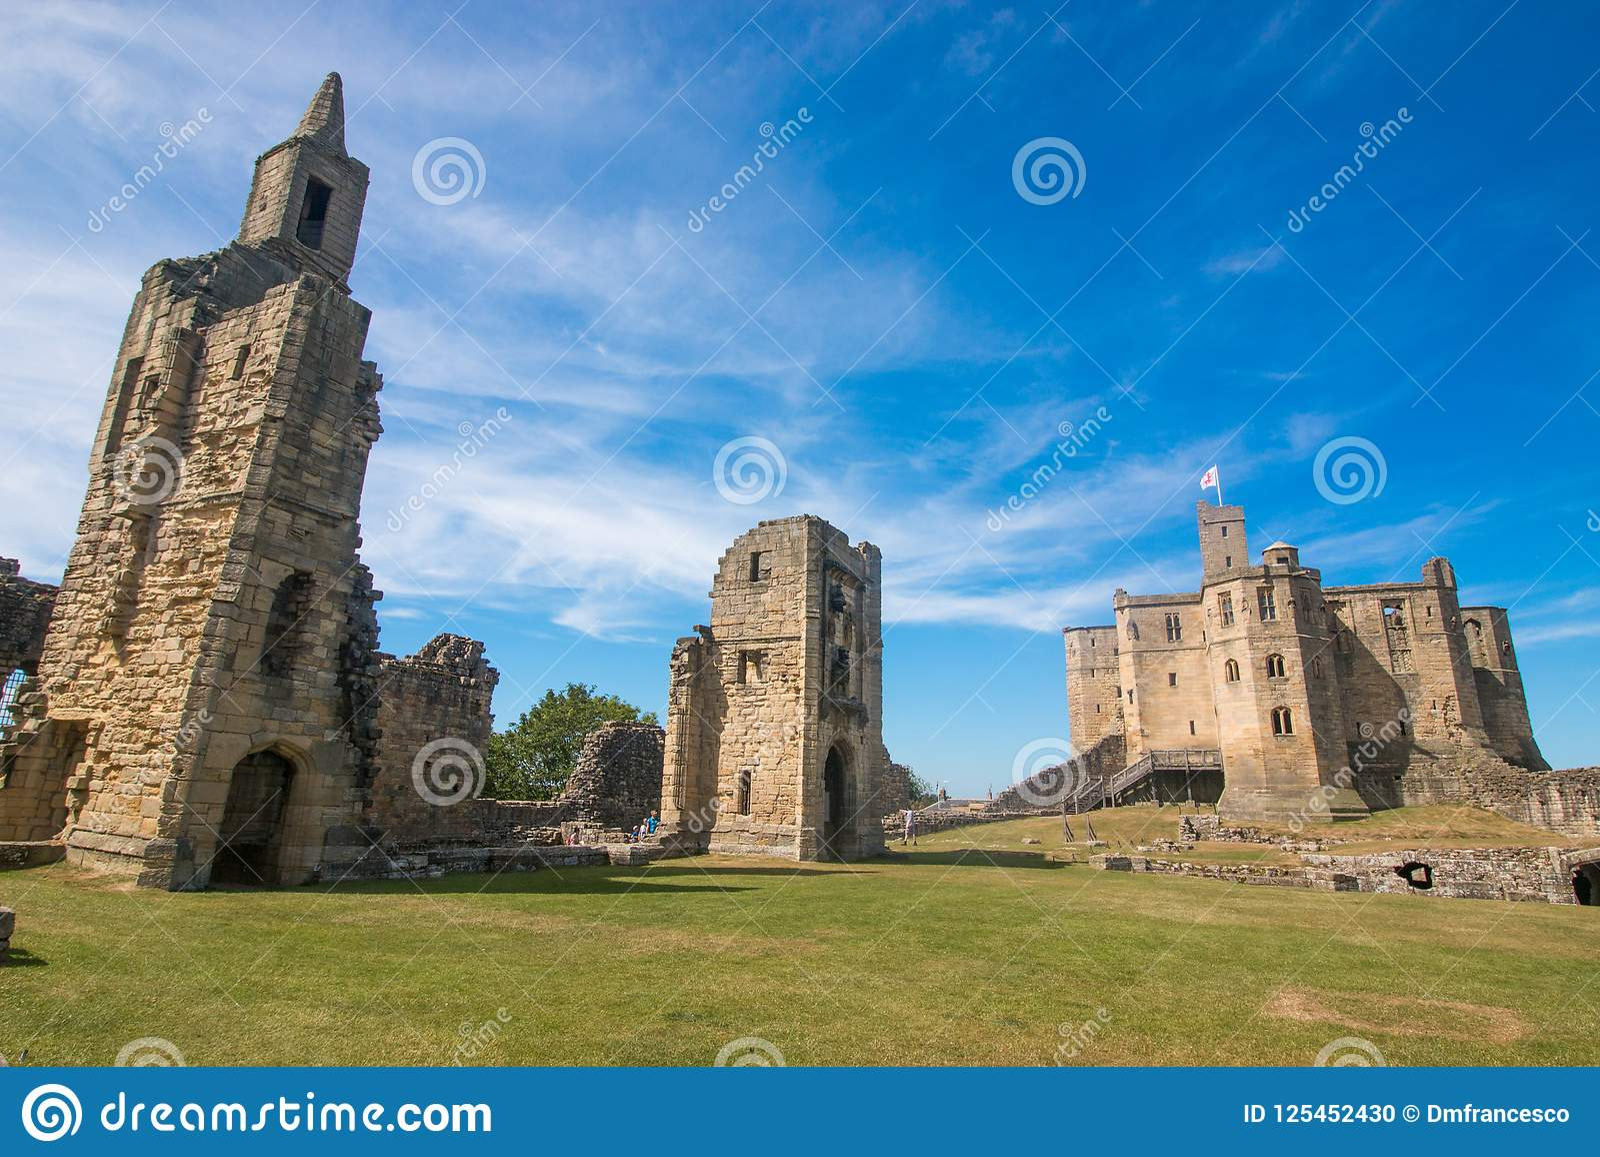 alnwick castle scotland united kingdom europe editorial image